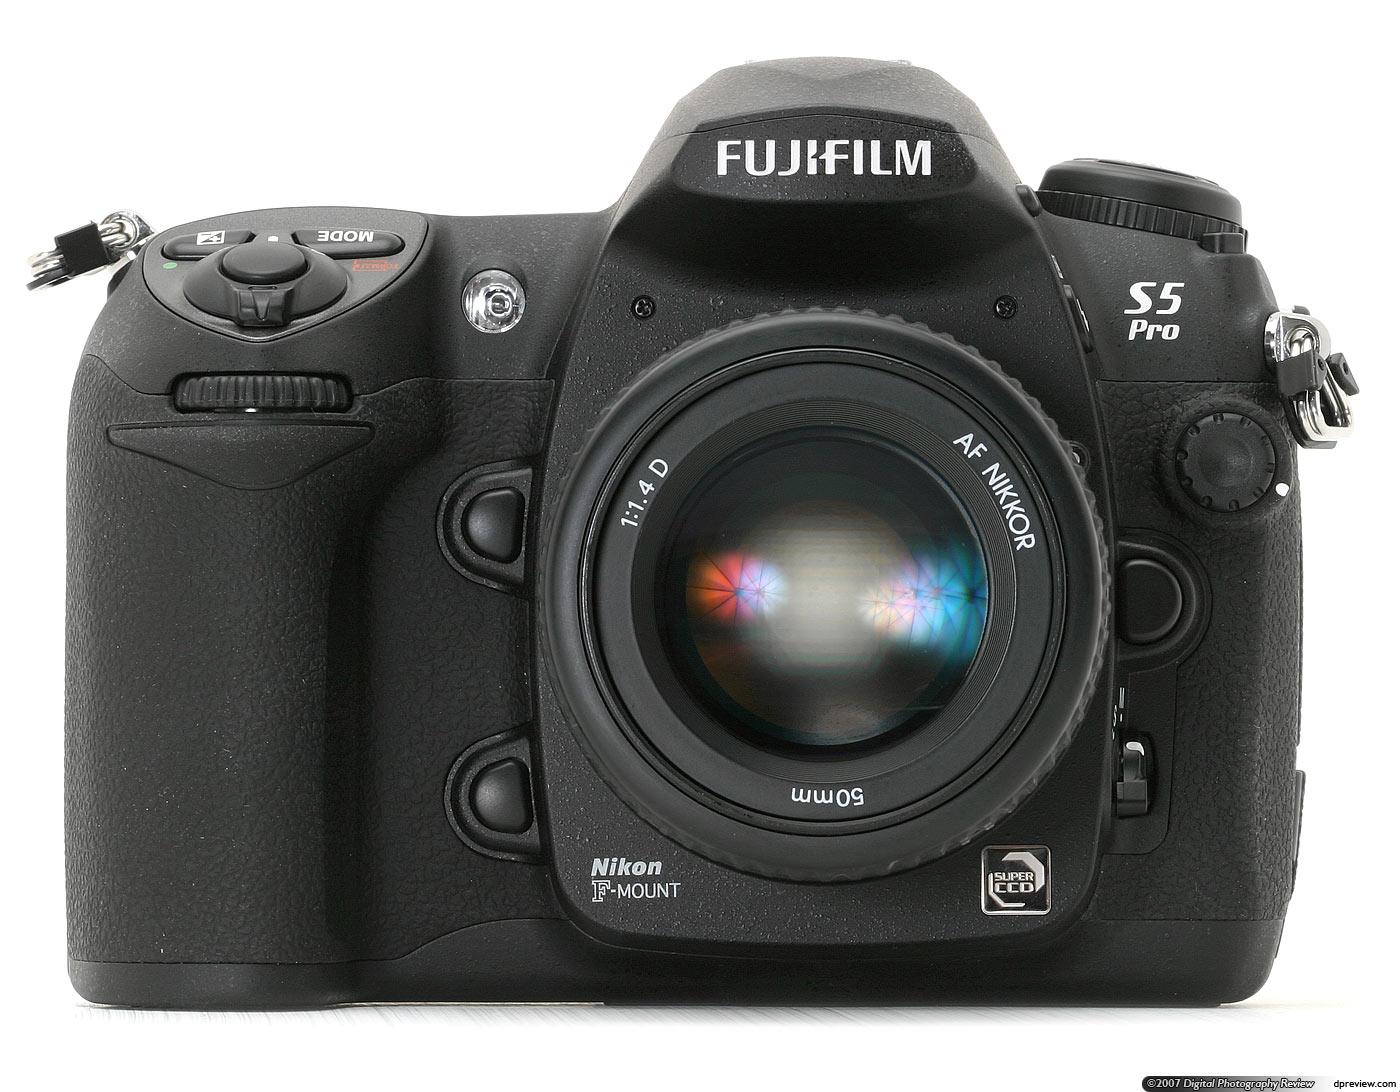 Camera Fujifilm Dslr Camera Price s5pro front jpeg fujifilm dslr cameras